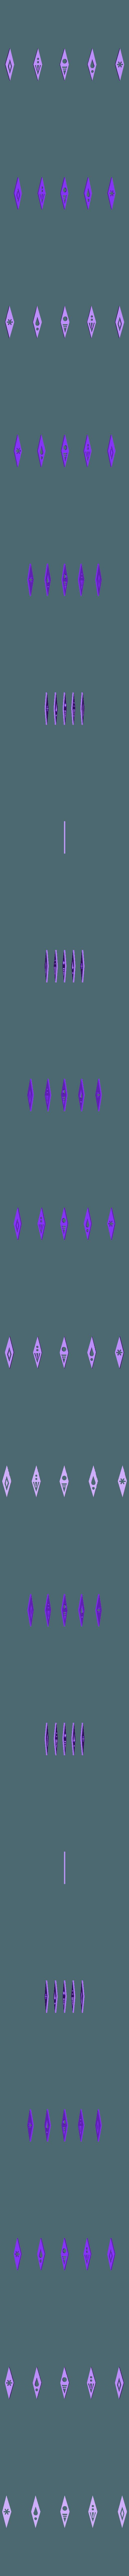 Element Pendants All Tops.stl Download STL file Element Pendants (Frozen 2) • 3D printable object, abbymath